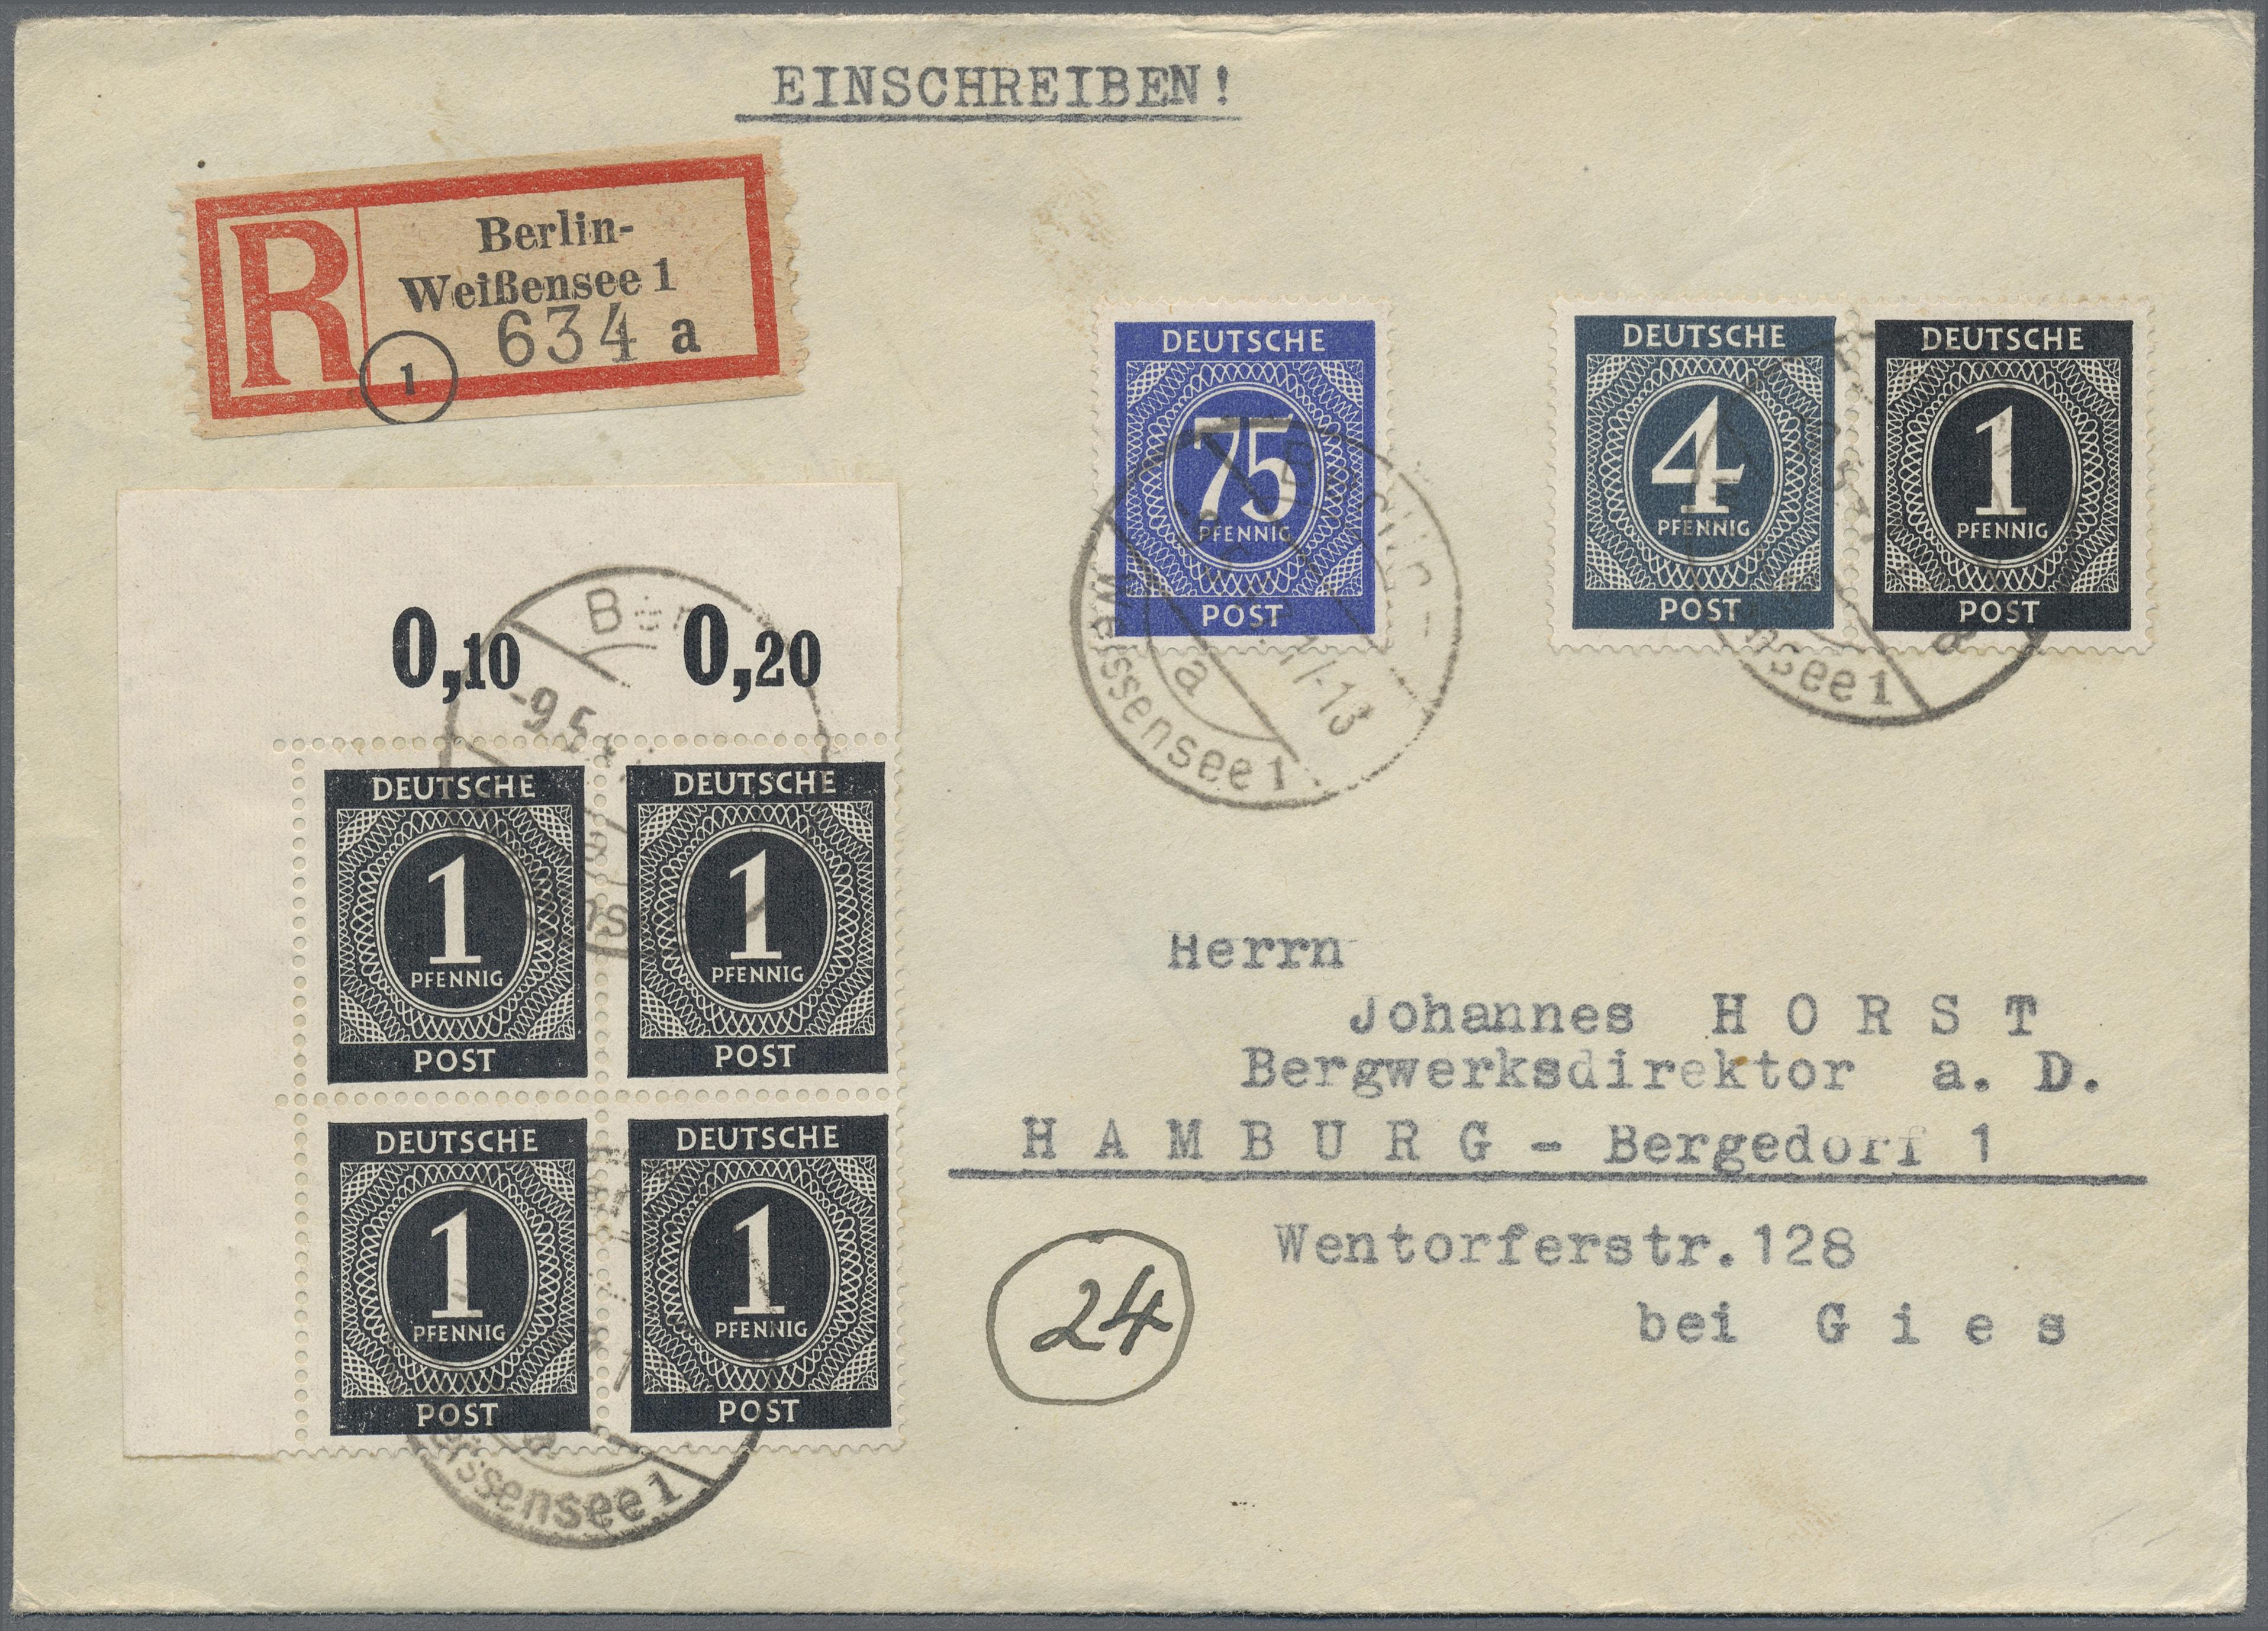 Lot 37893 - Alliierte Besetzung - Gemeinschaftsausgaben  -  Auktionshaus Christoph Gärtner GmbH & Co. KG Collections Germany,  Collections Supplement, Surprise boxes #39 Day 7